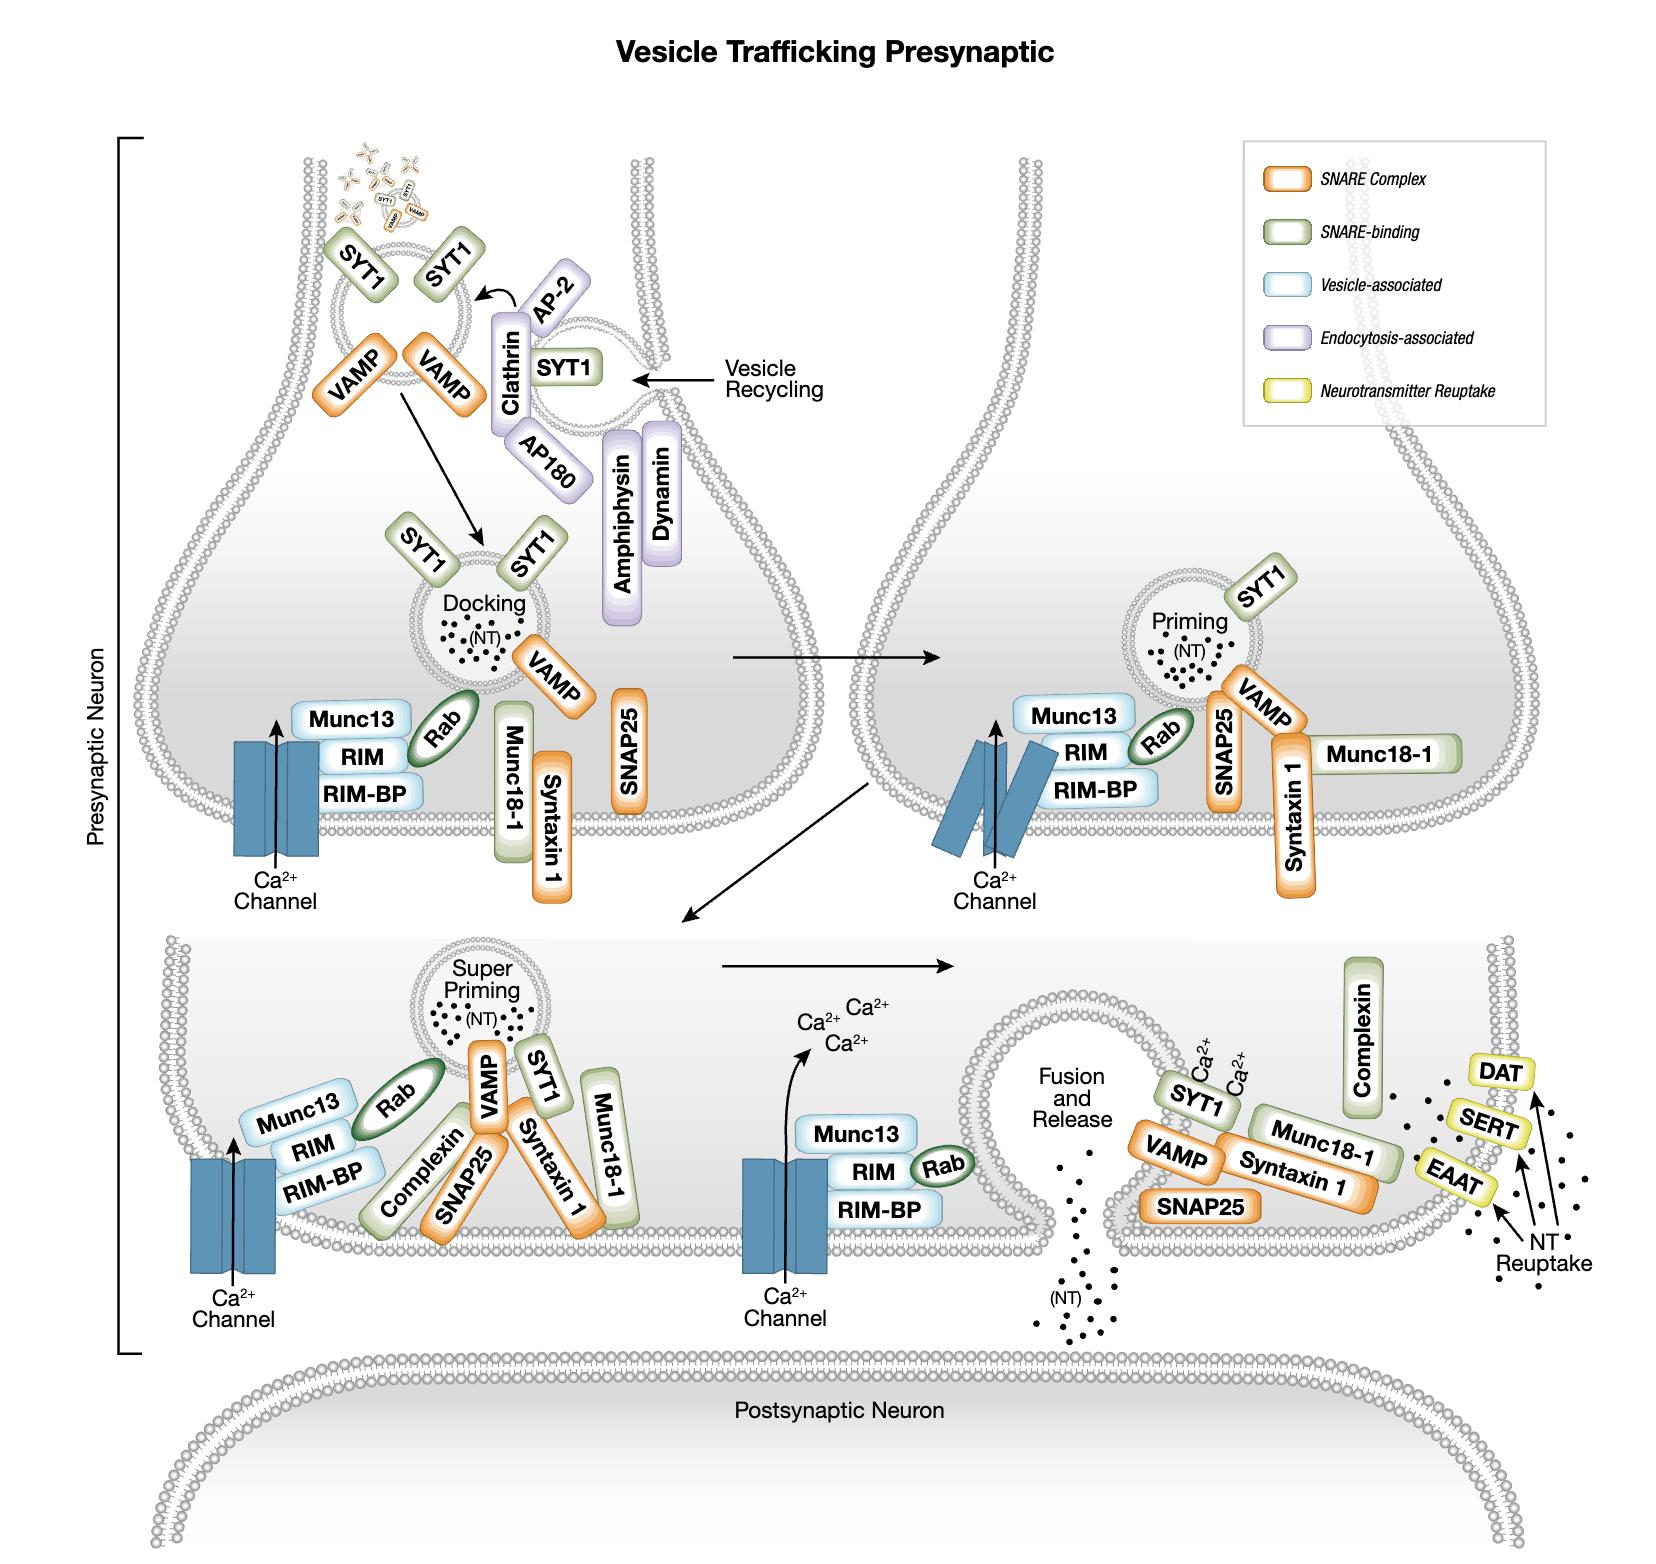 Vesicle Trafficking Presynaptic Interactive Signaling Pathway